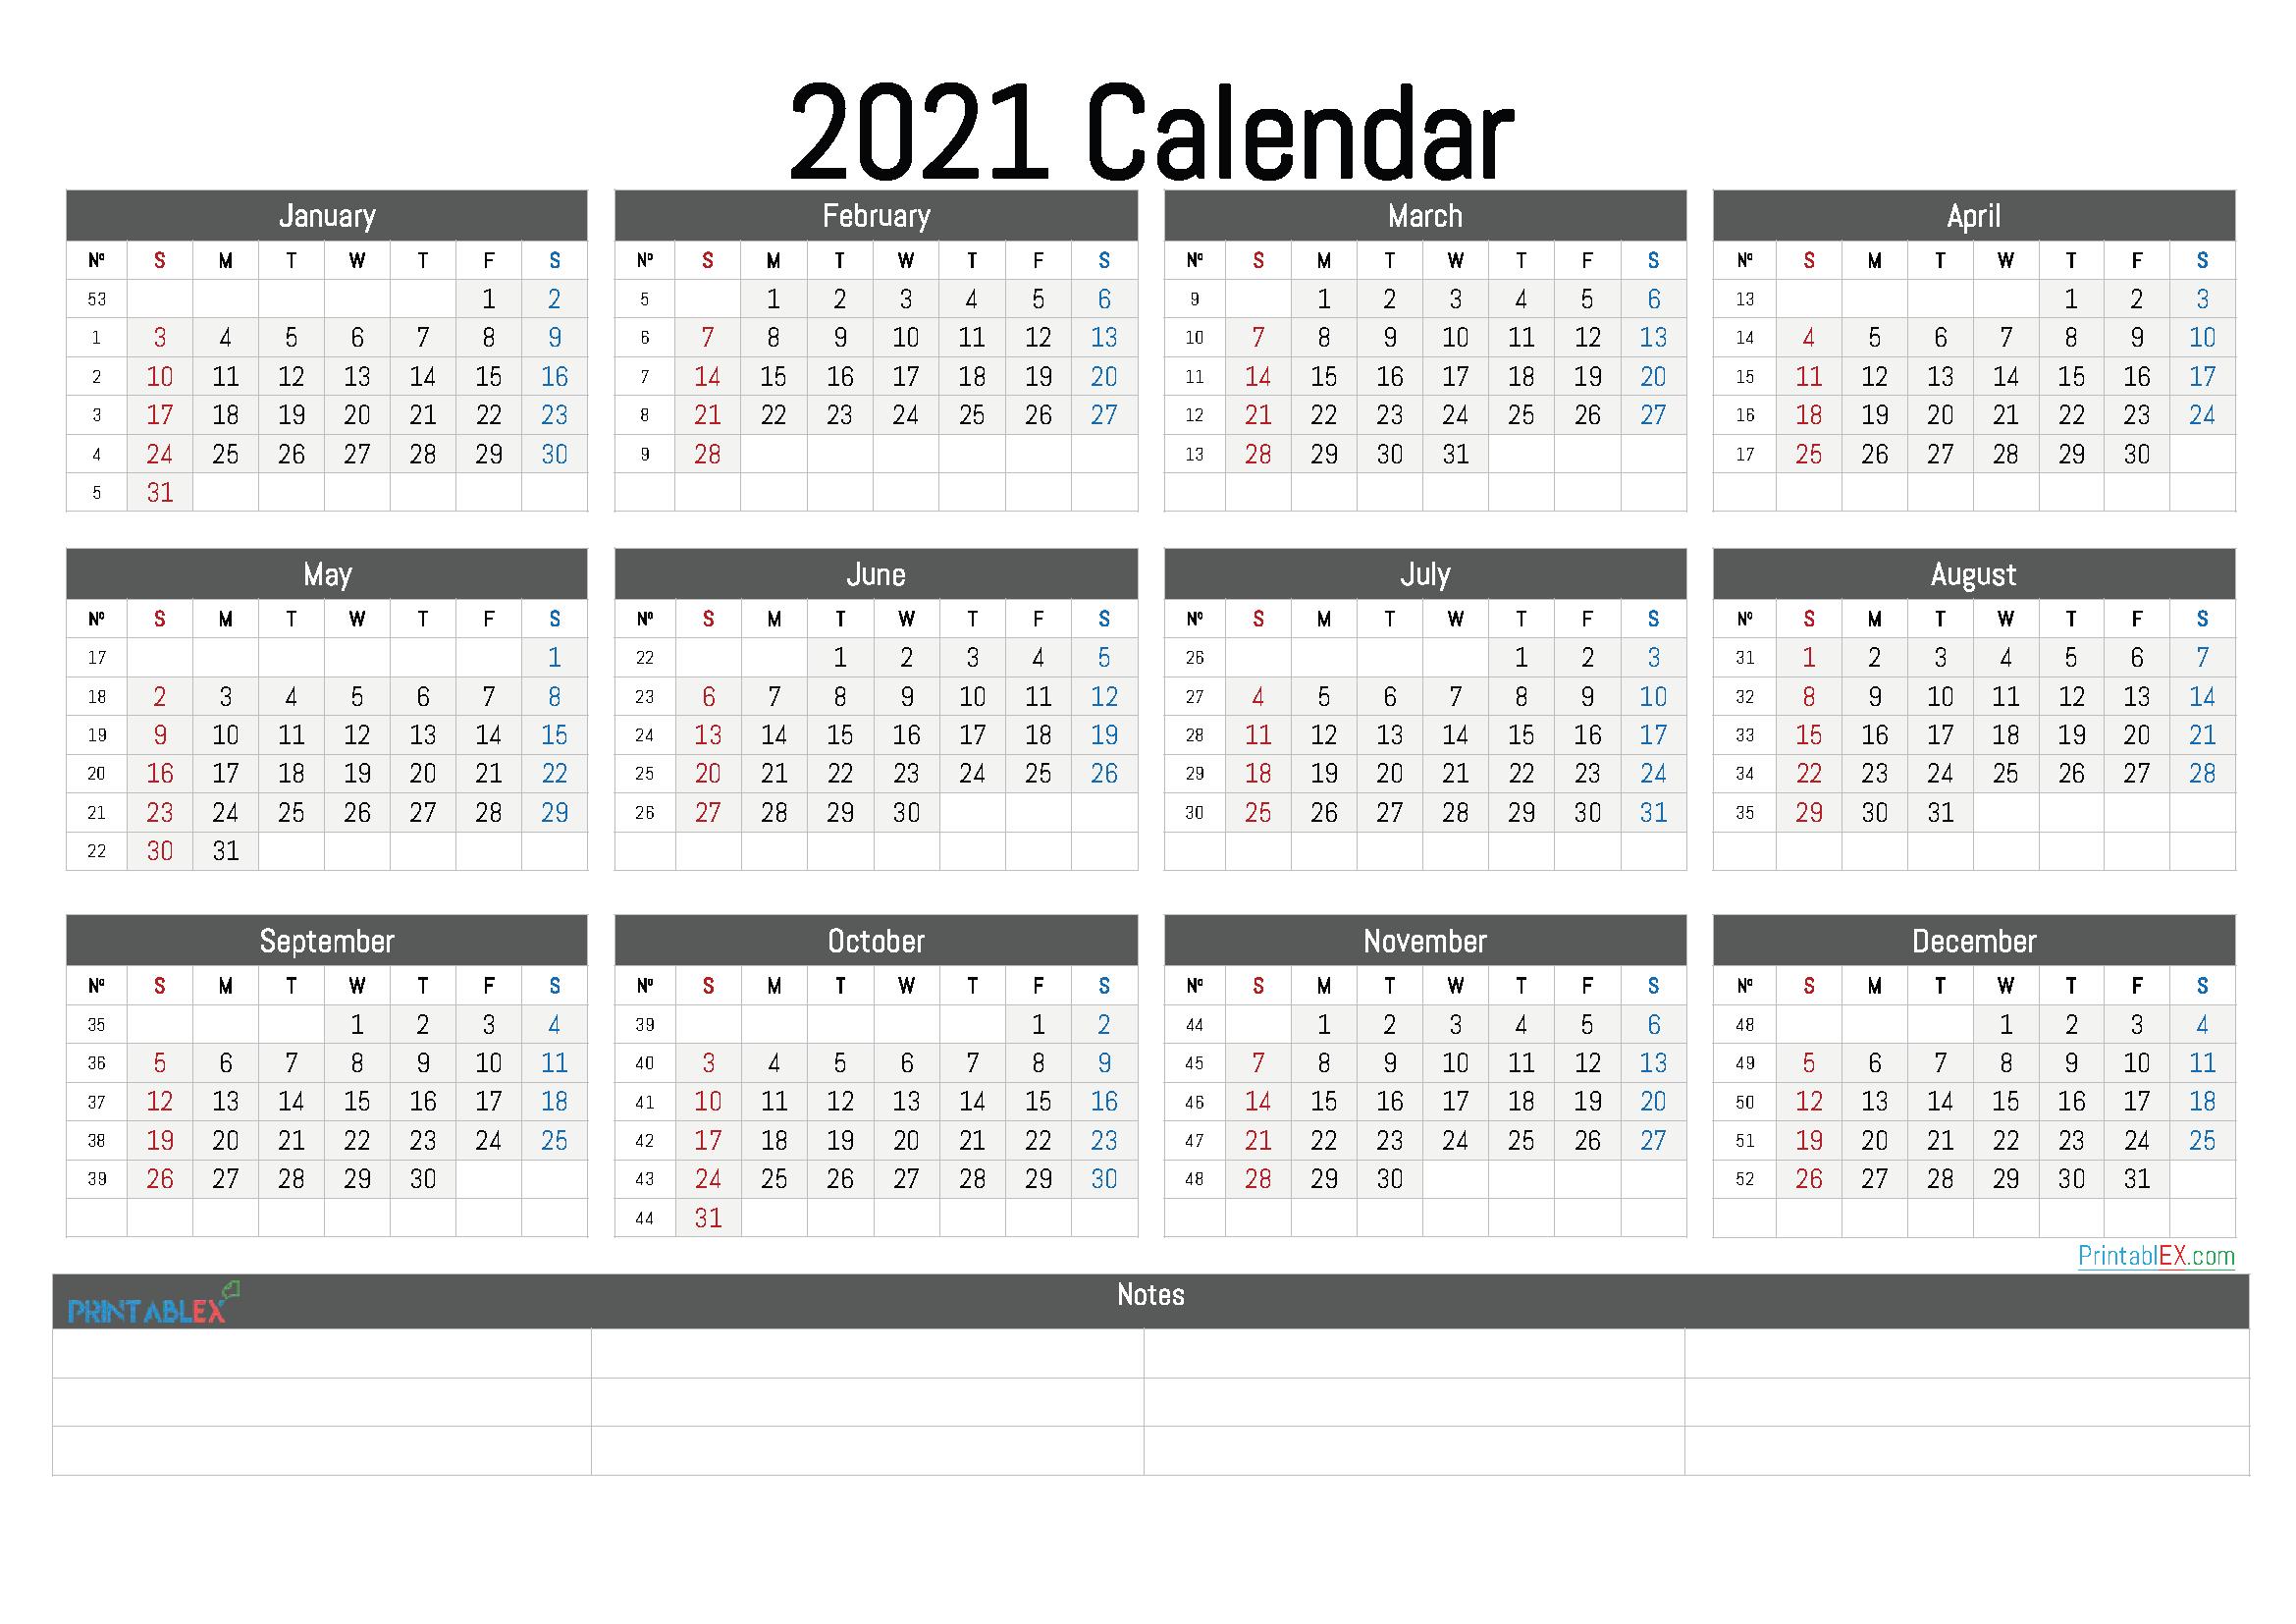 Printable 2021 Calendar By Month with 3 Month Blank Printable Calendar 2021